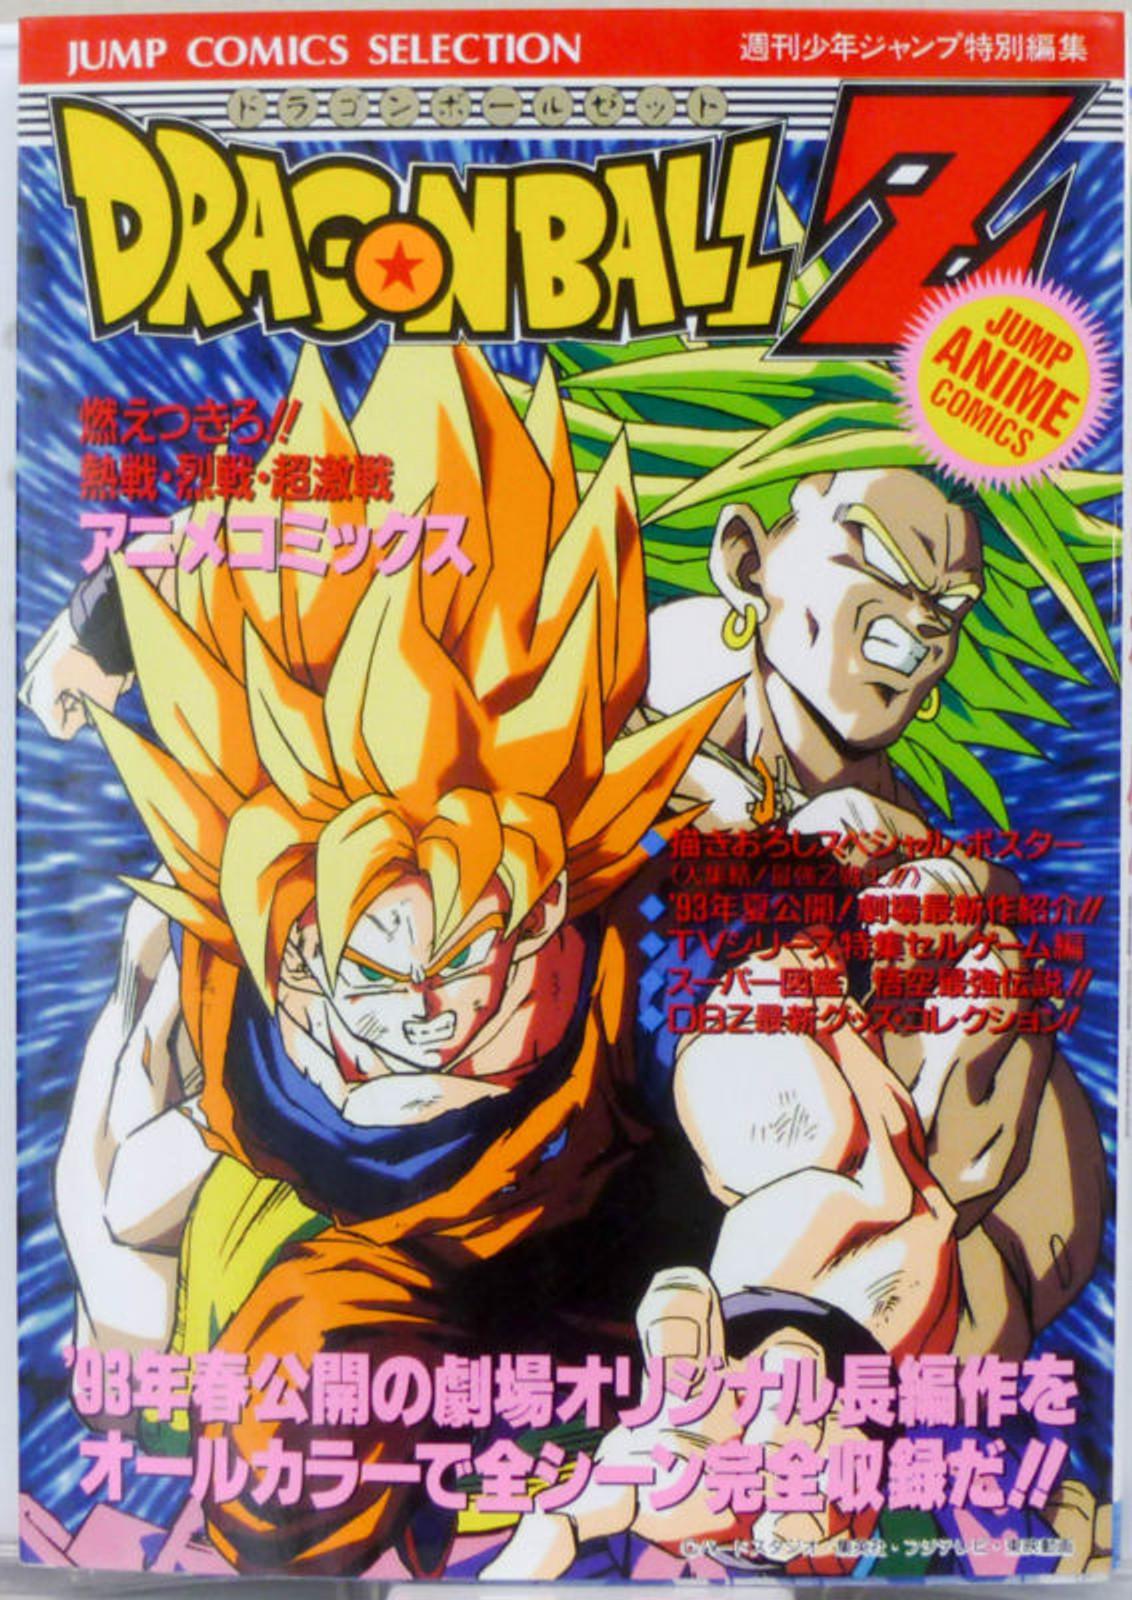 Dragon Ball Z Anime Movie Film Comics Book JAPAN ANIME MANGA 3